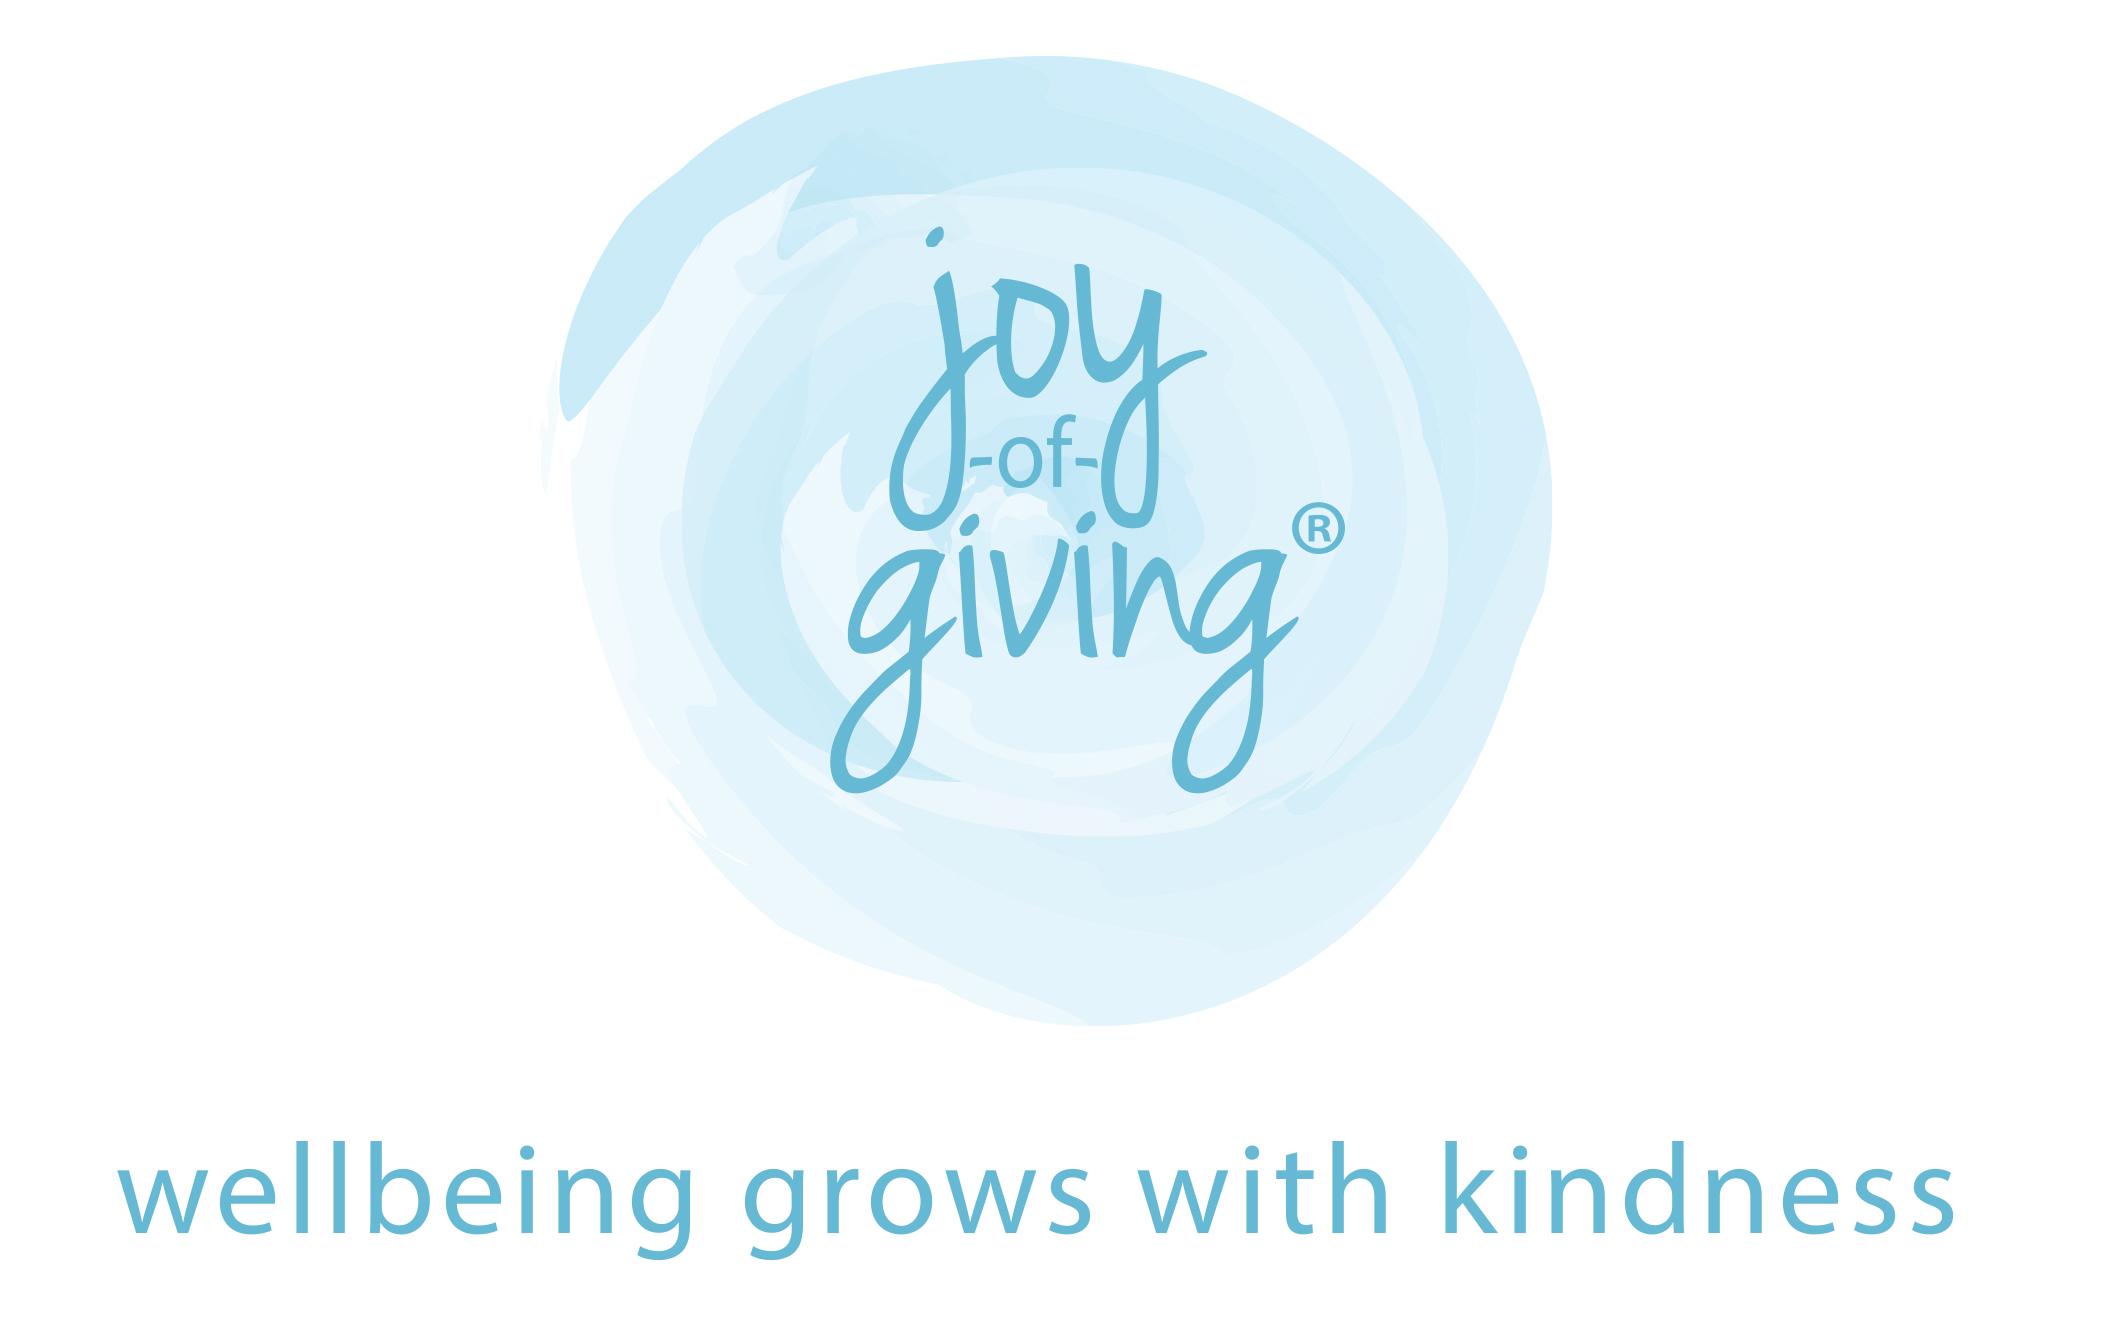 Joy of Giving _logo+tagline2 (002).jpg